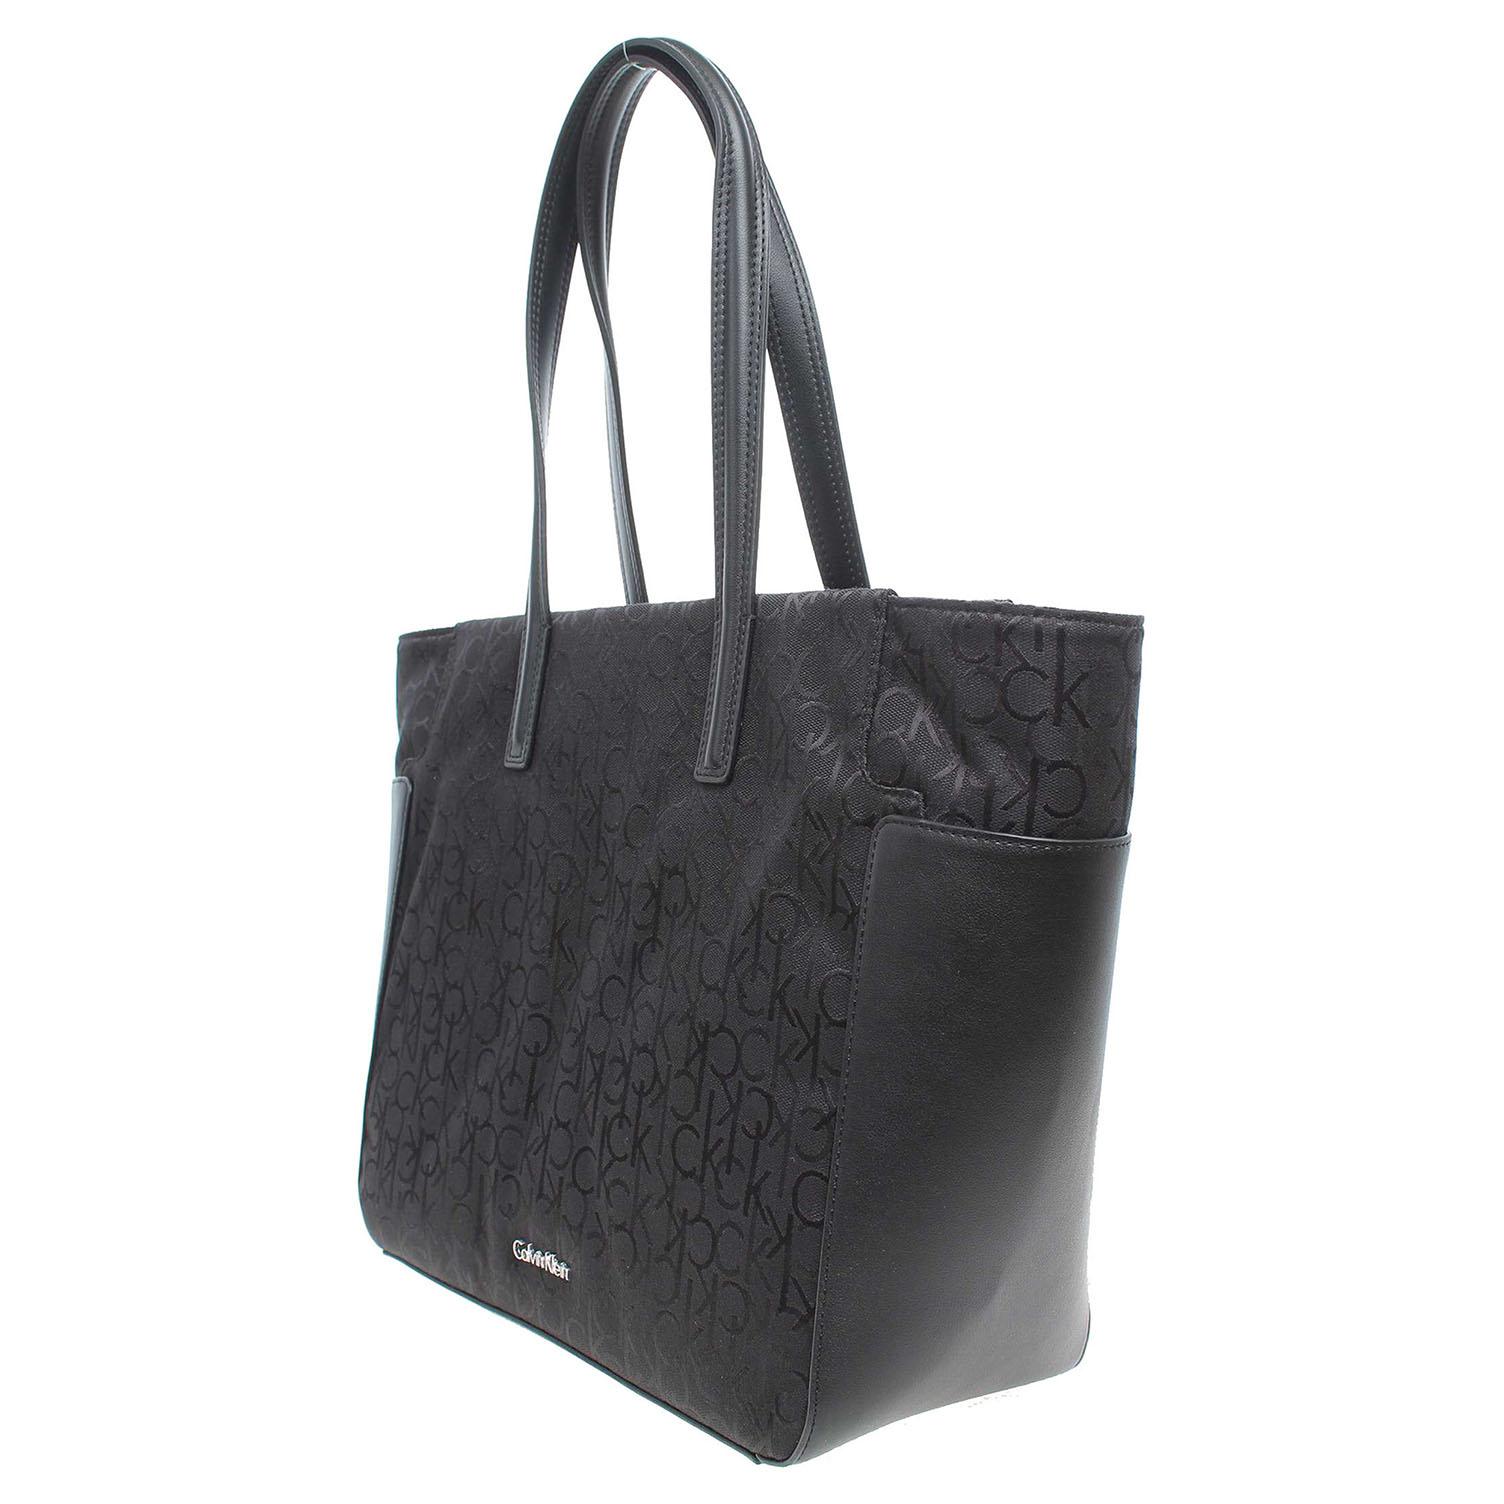 Ecco Calvin Klein dámská kabelka K60K602248 černá 11891186